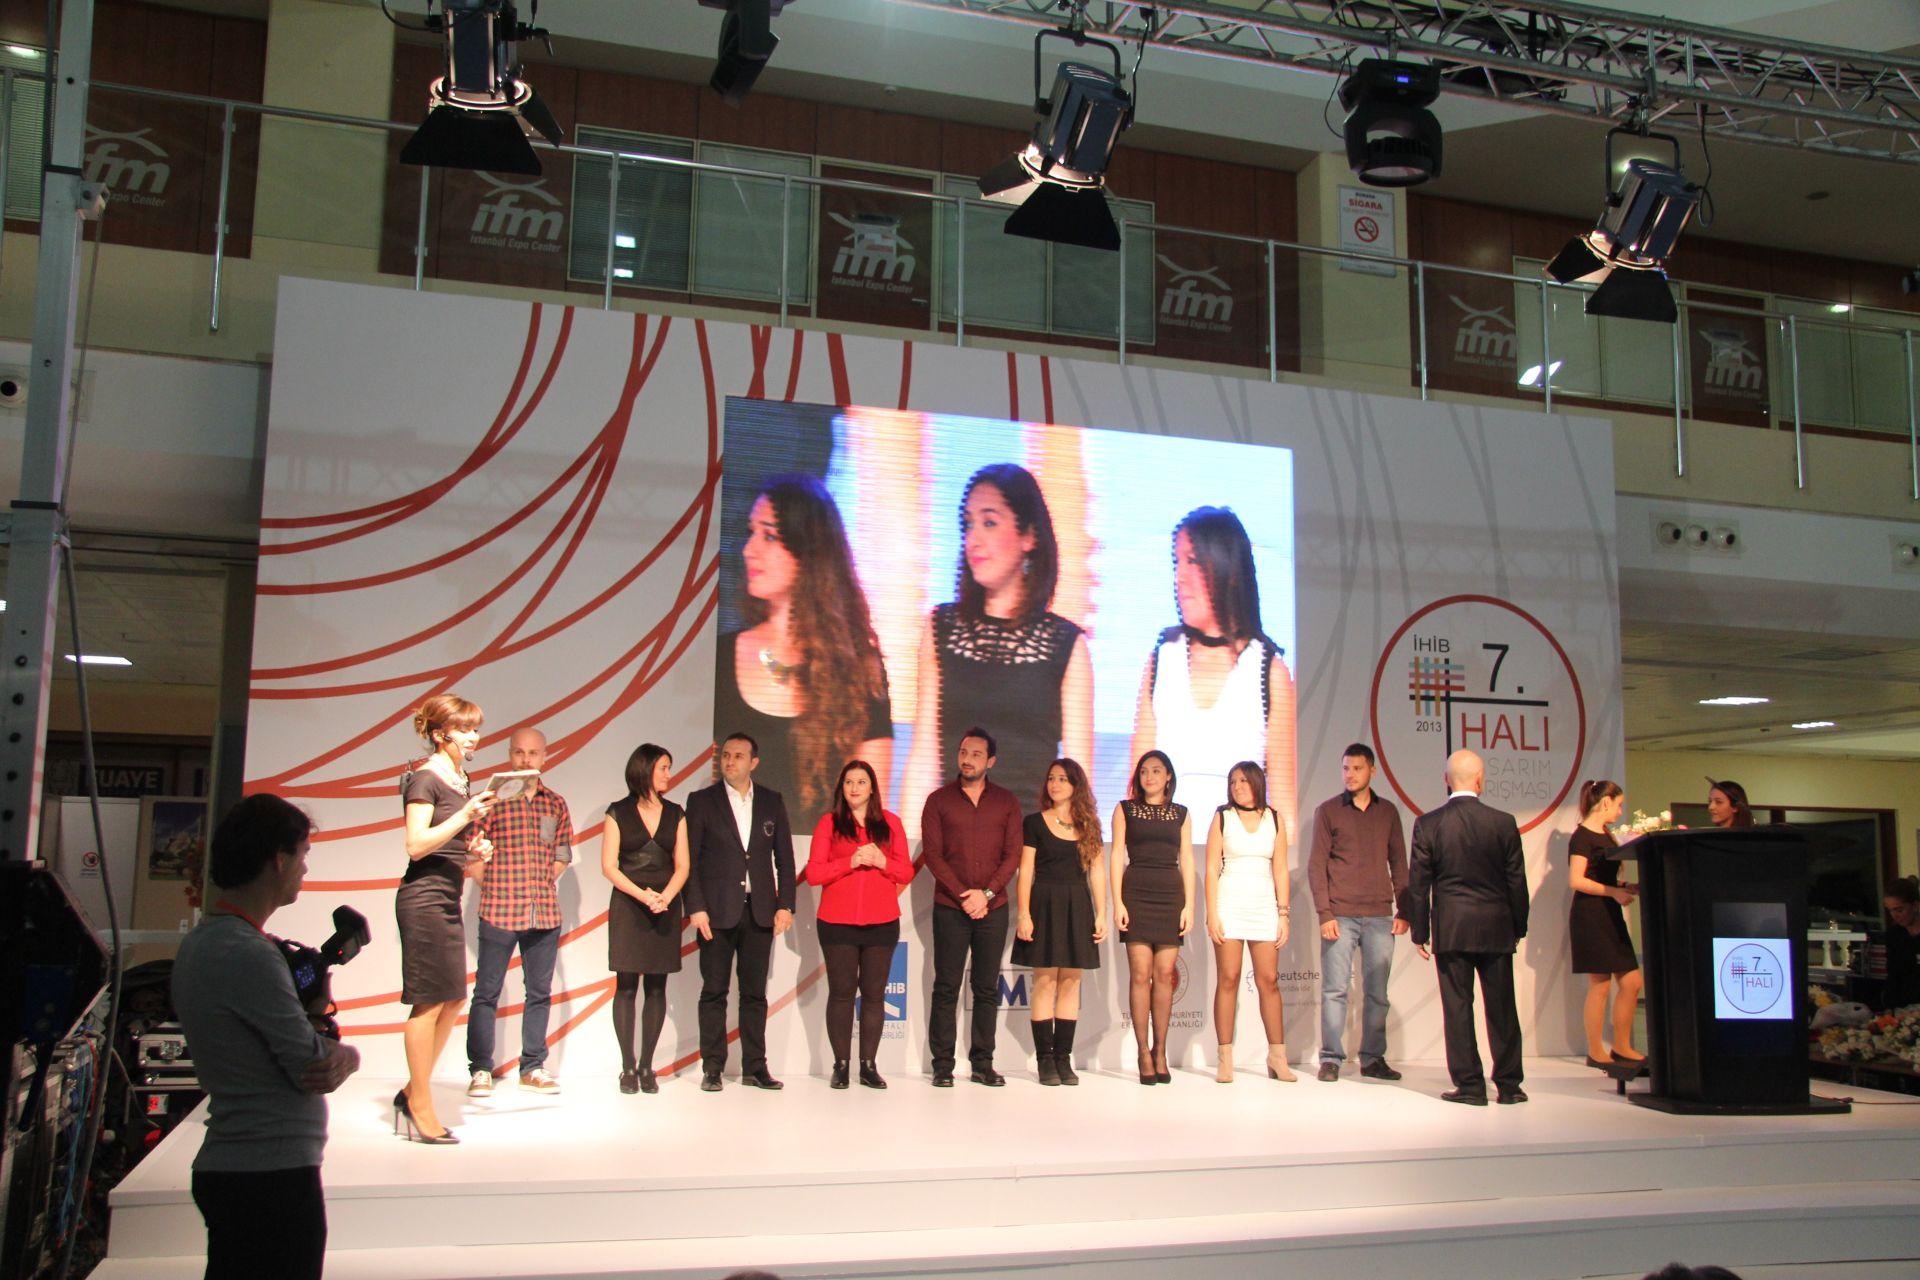 DOMOTEX Turkey 2013 IHIB Carpet Competition Award Ceremony